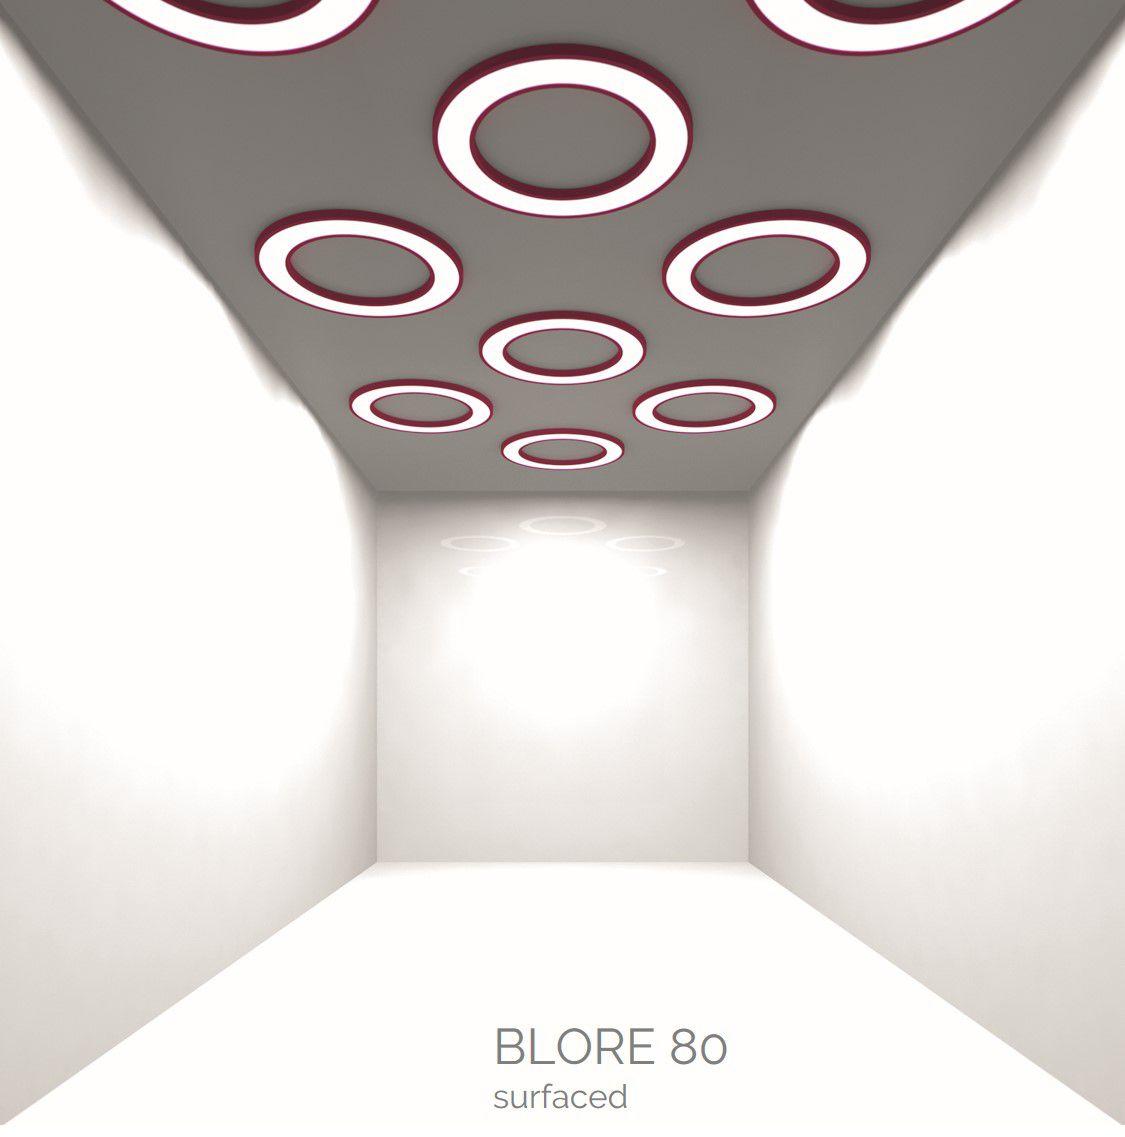 blore 80 opbouw armatuur ring 1500x80mm 3000k 8915lm 105w fix